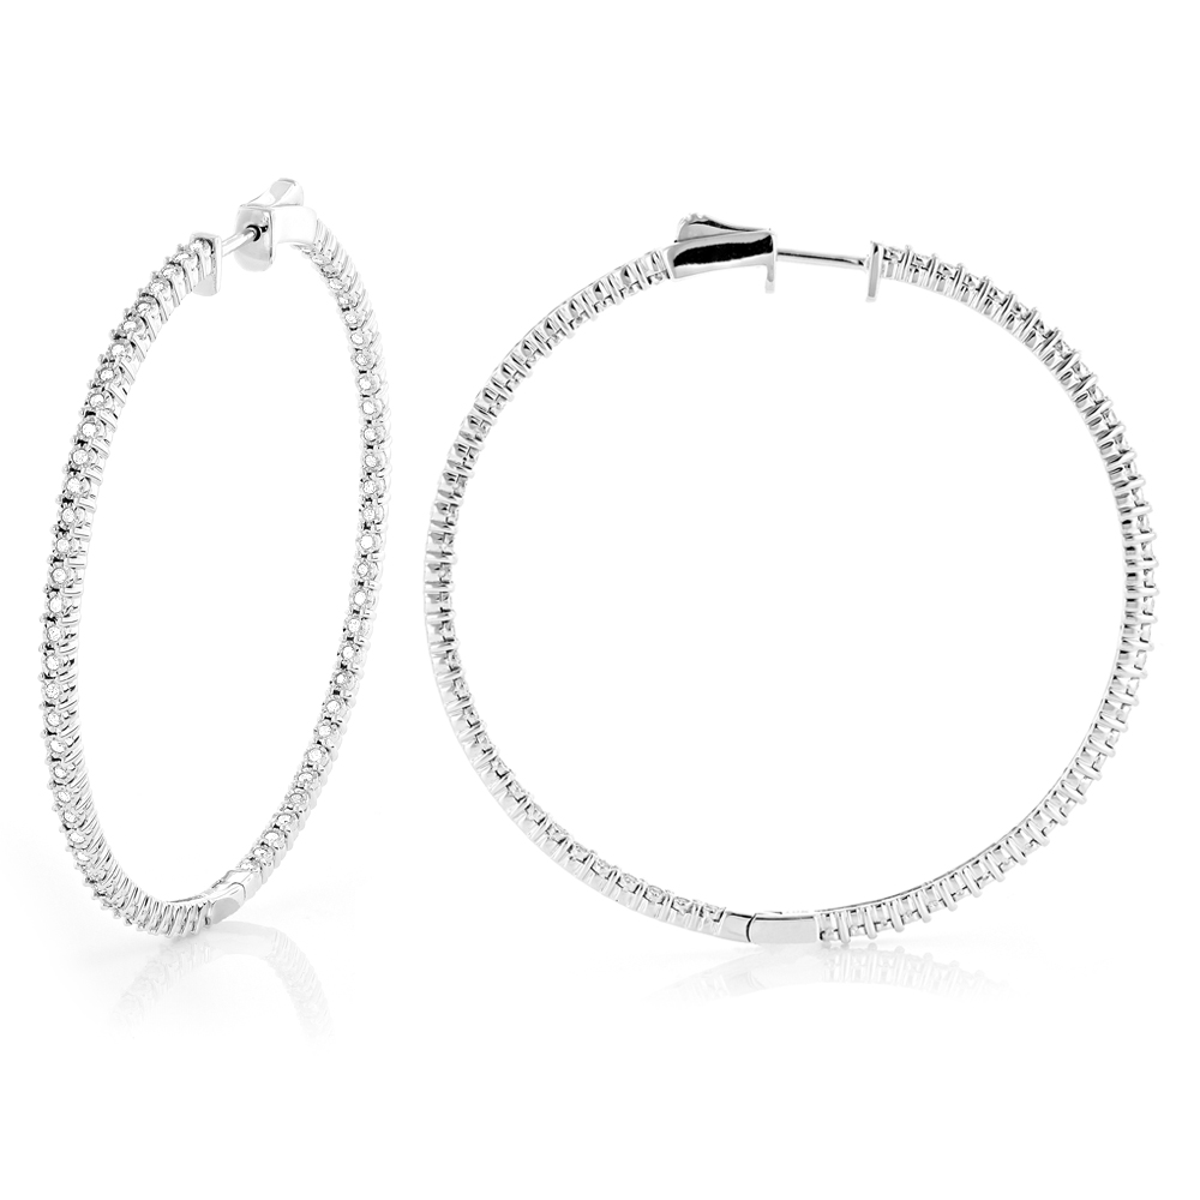 2 Inch Diamond Hoop Earrings 1ct 14K Gold Inside Out Hoops